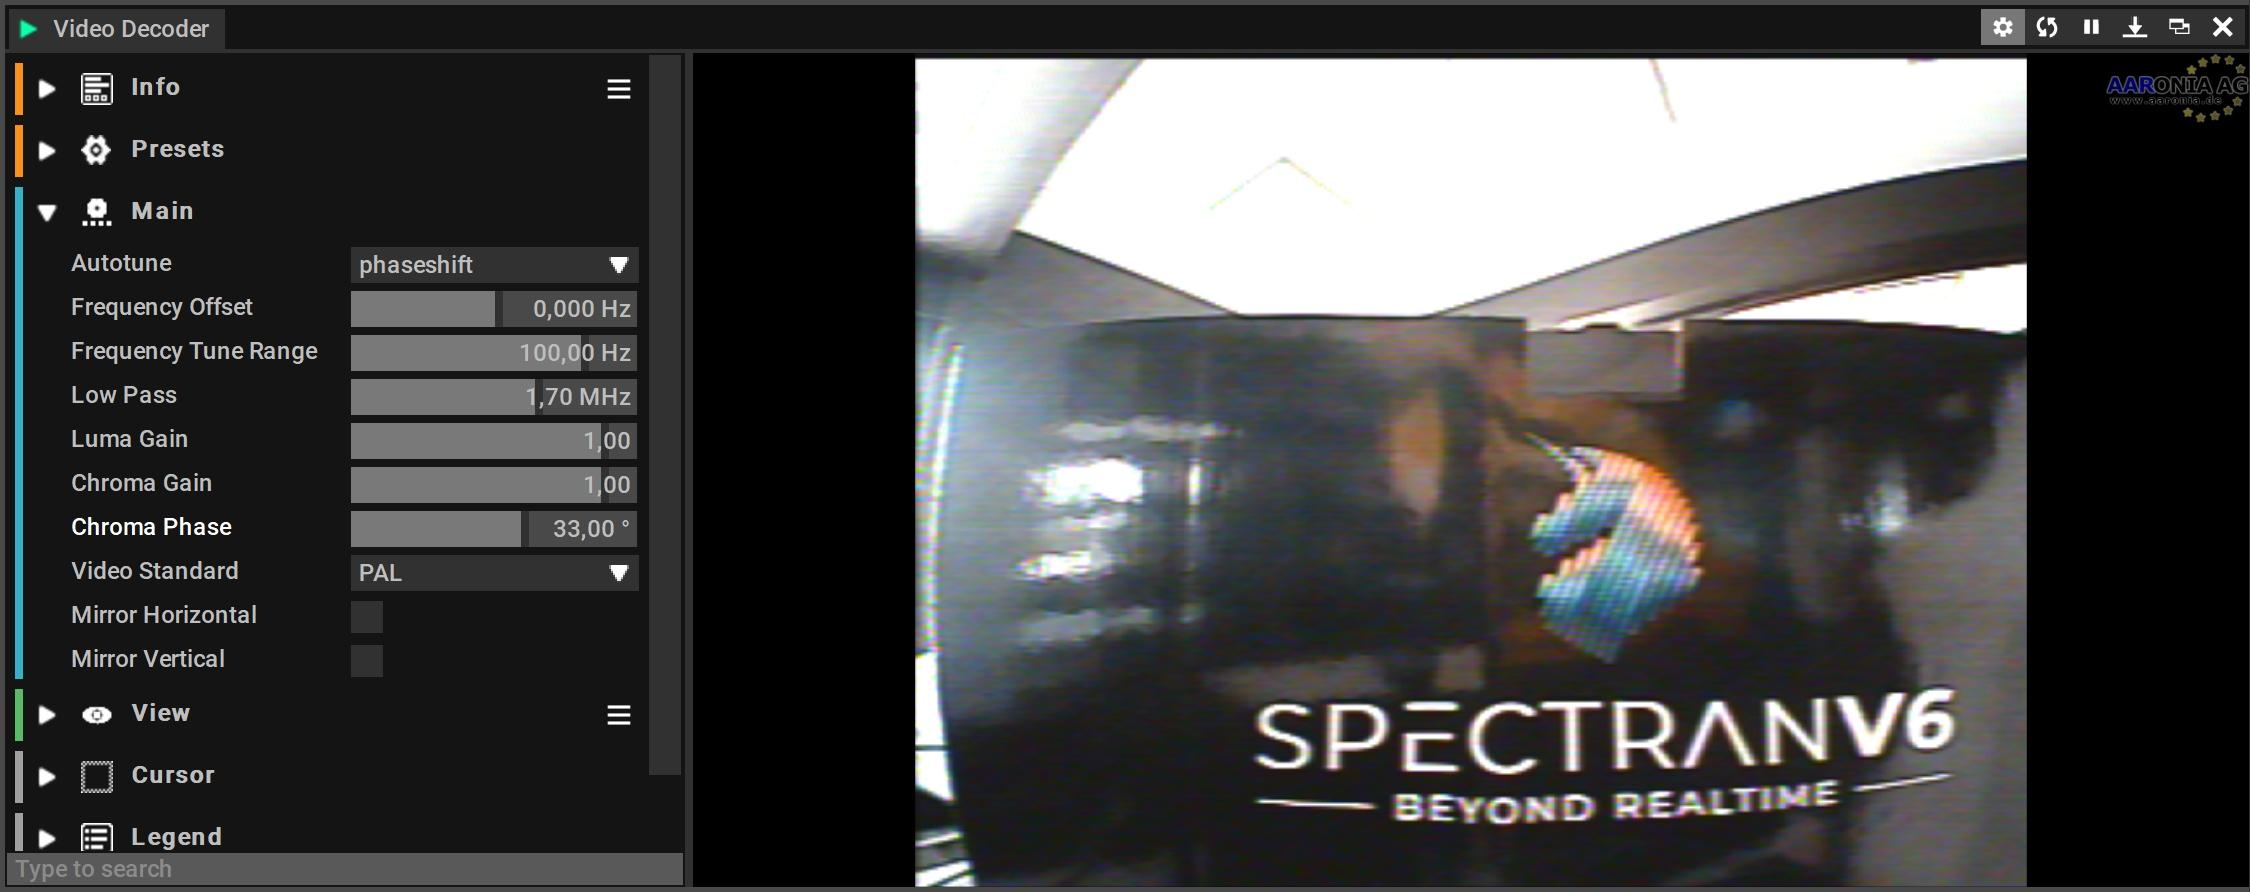 IQ NTSC/PAL Video Decoder